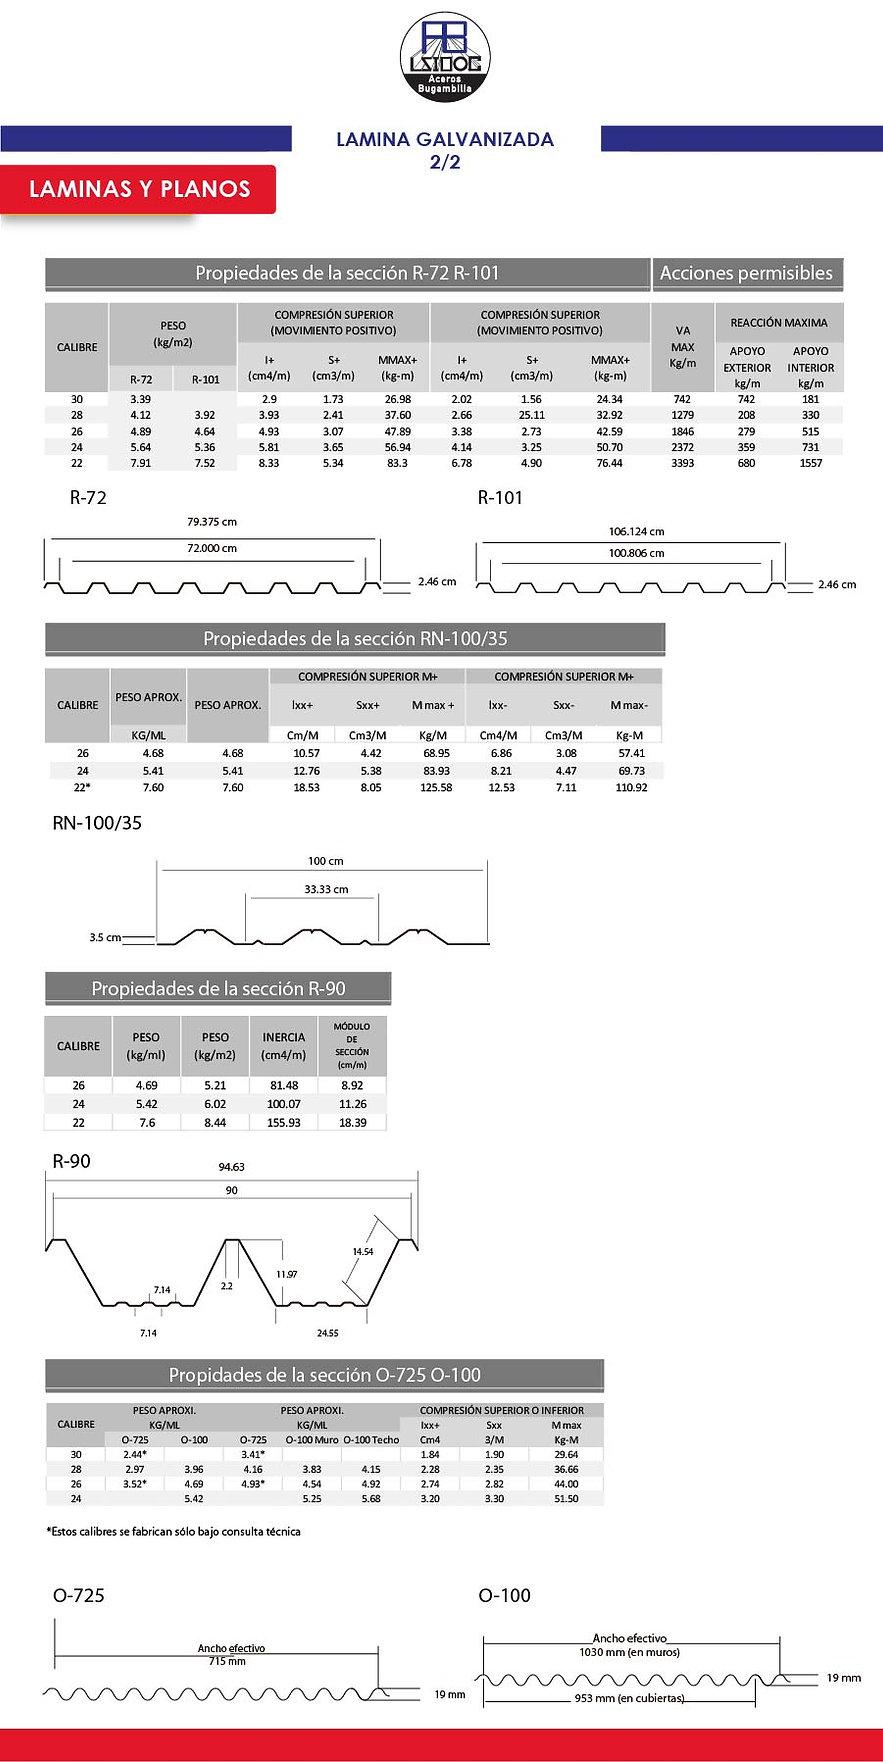 TABLAS WEB 3.0_LAMINA GALVANIZADA 2-2 (3